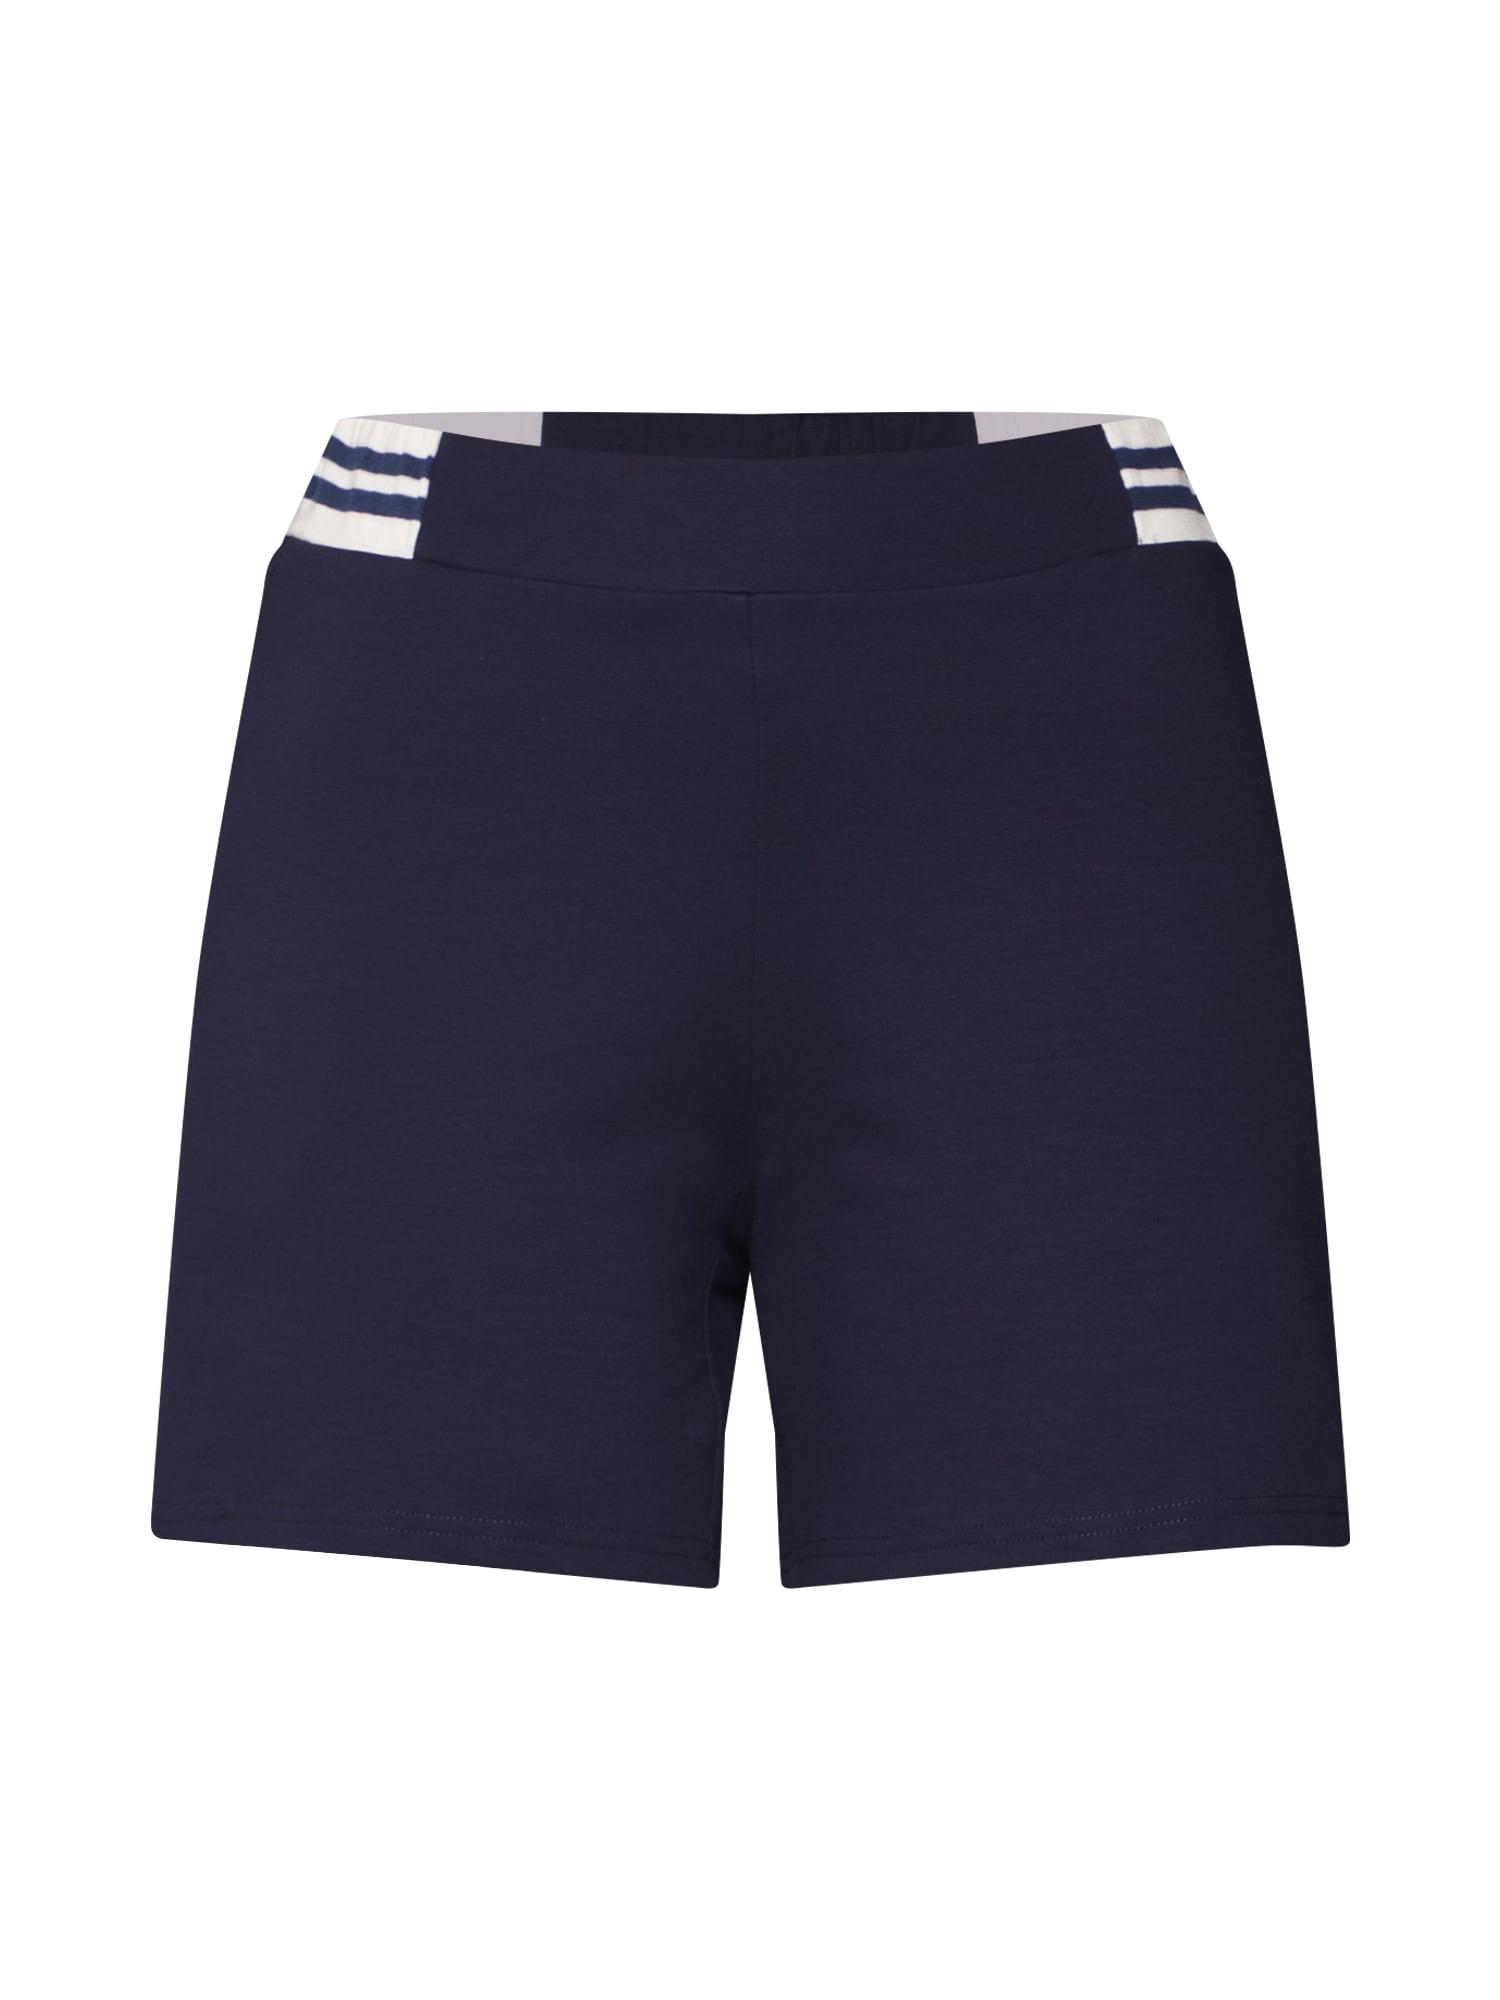 Kalhotky Favourites Trend 1 tmavě modrá CALIDA